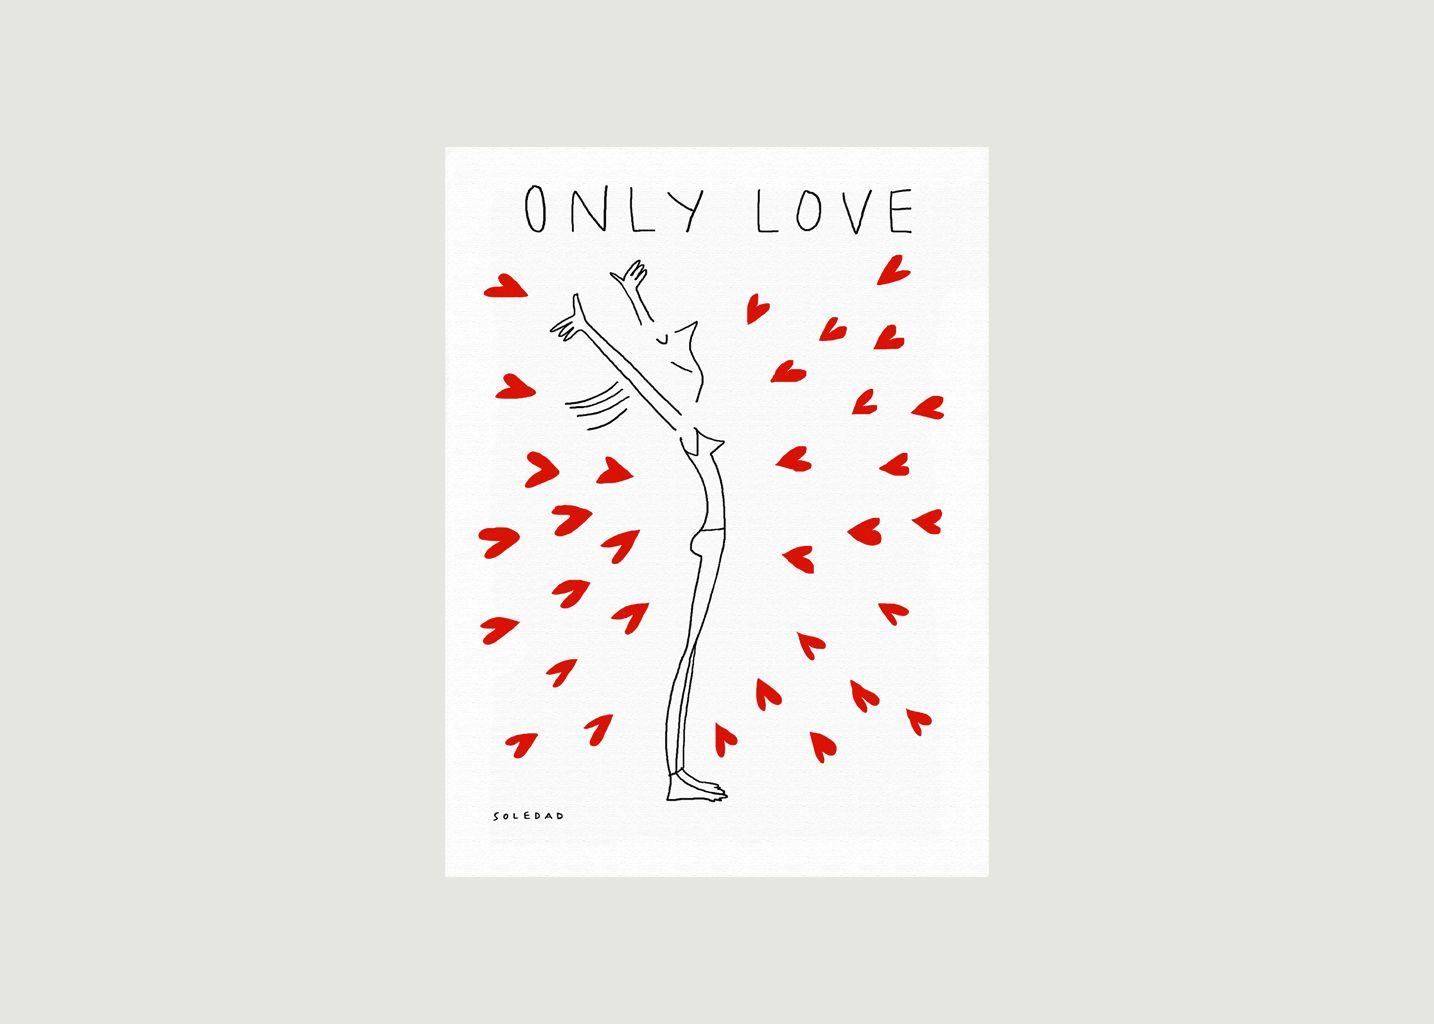 Affiche Soledad Only Love - Image Republic